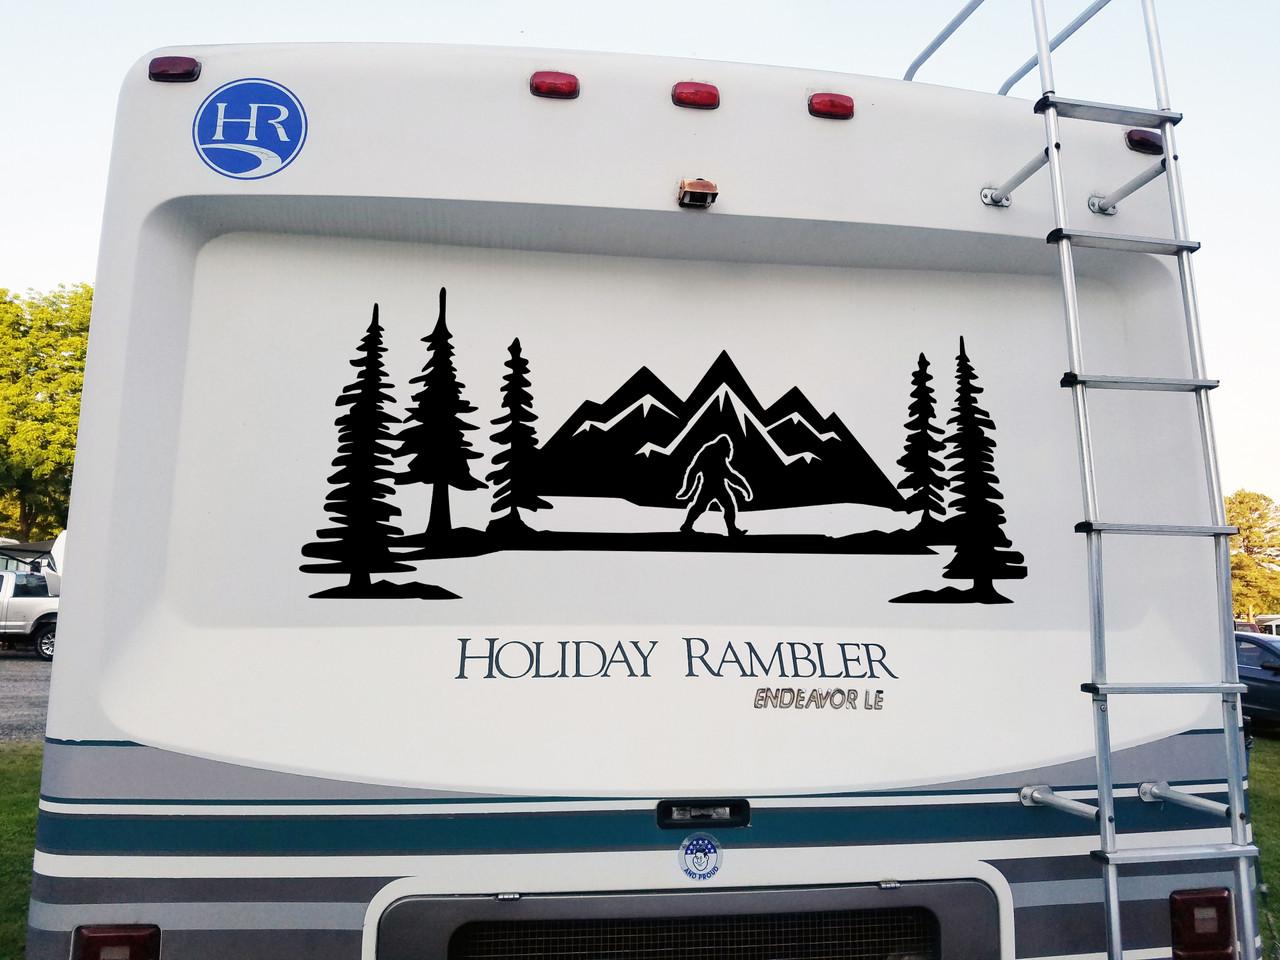 Bigfoot Sasquatch Mountains Scene Vinyl Decal V9 - PNW Trees RV Graphics Travel Trailer Camper - Die Cut Sticker